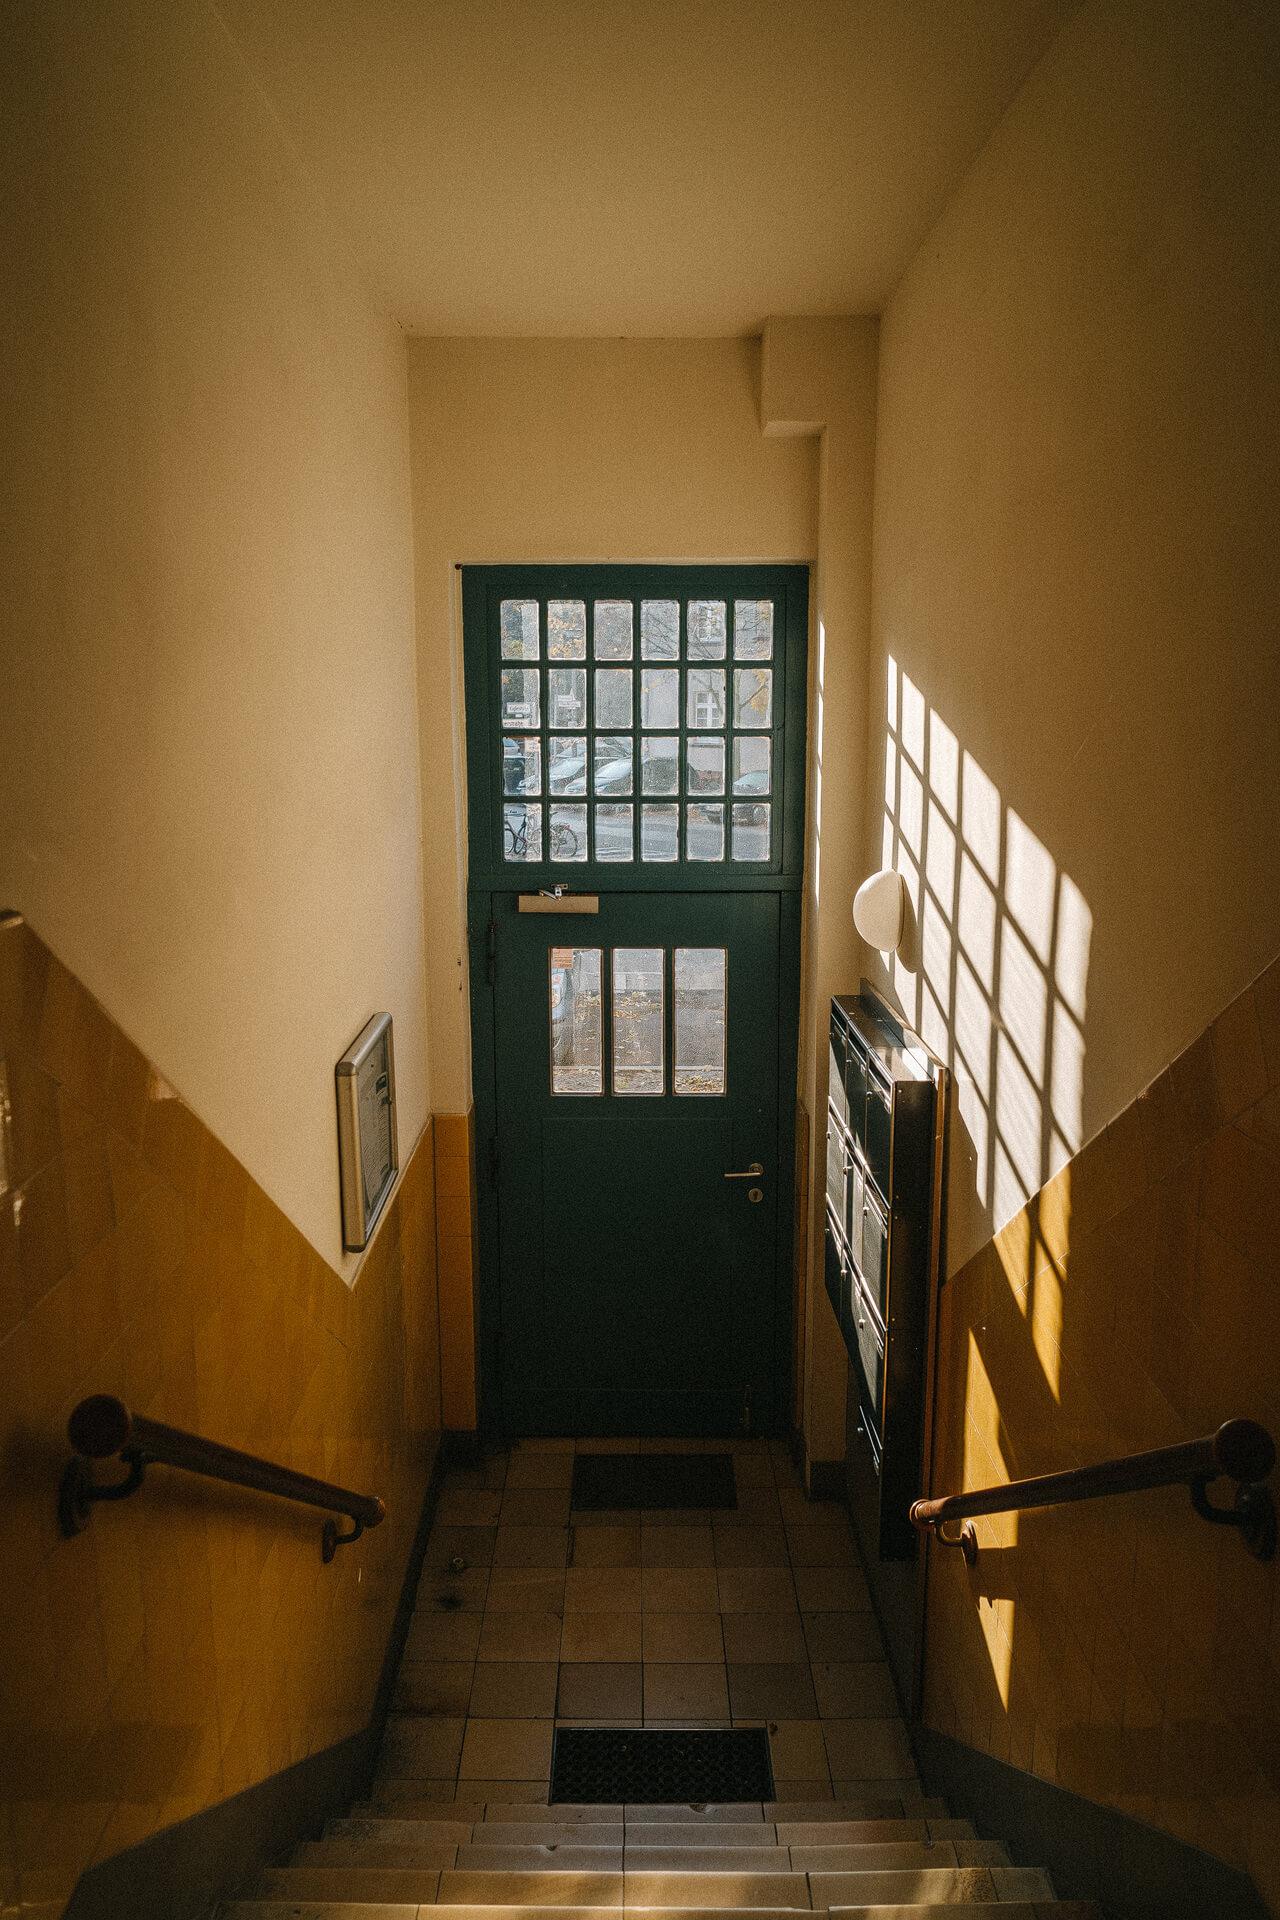 Interior apartment, lights, hall